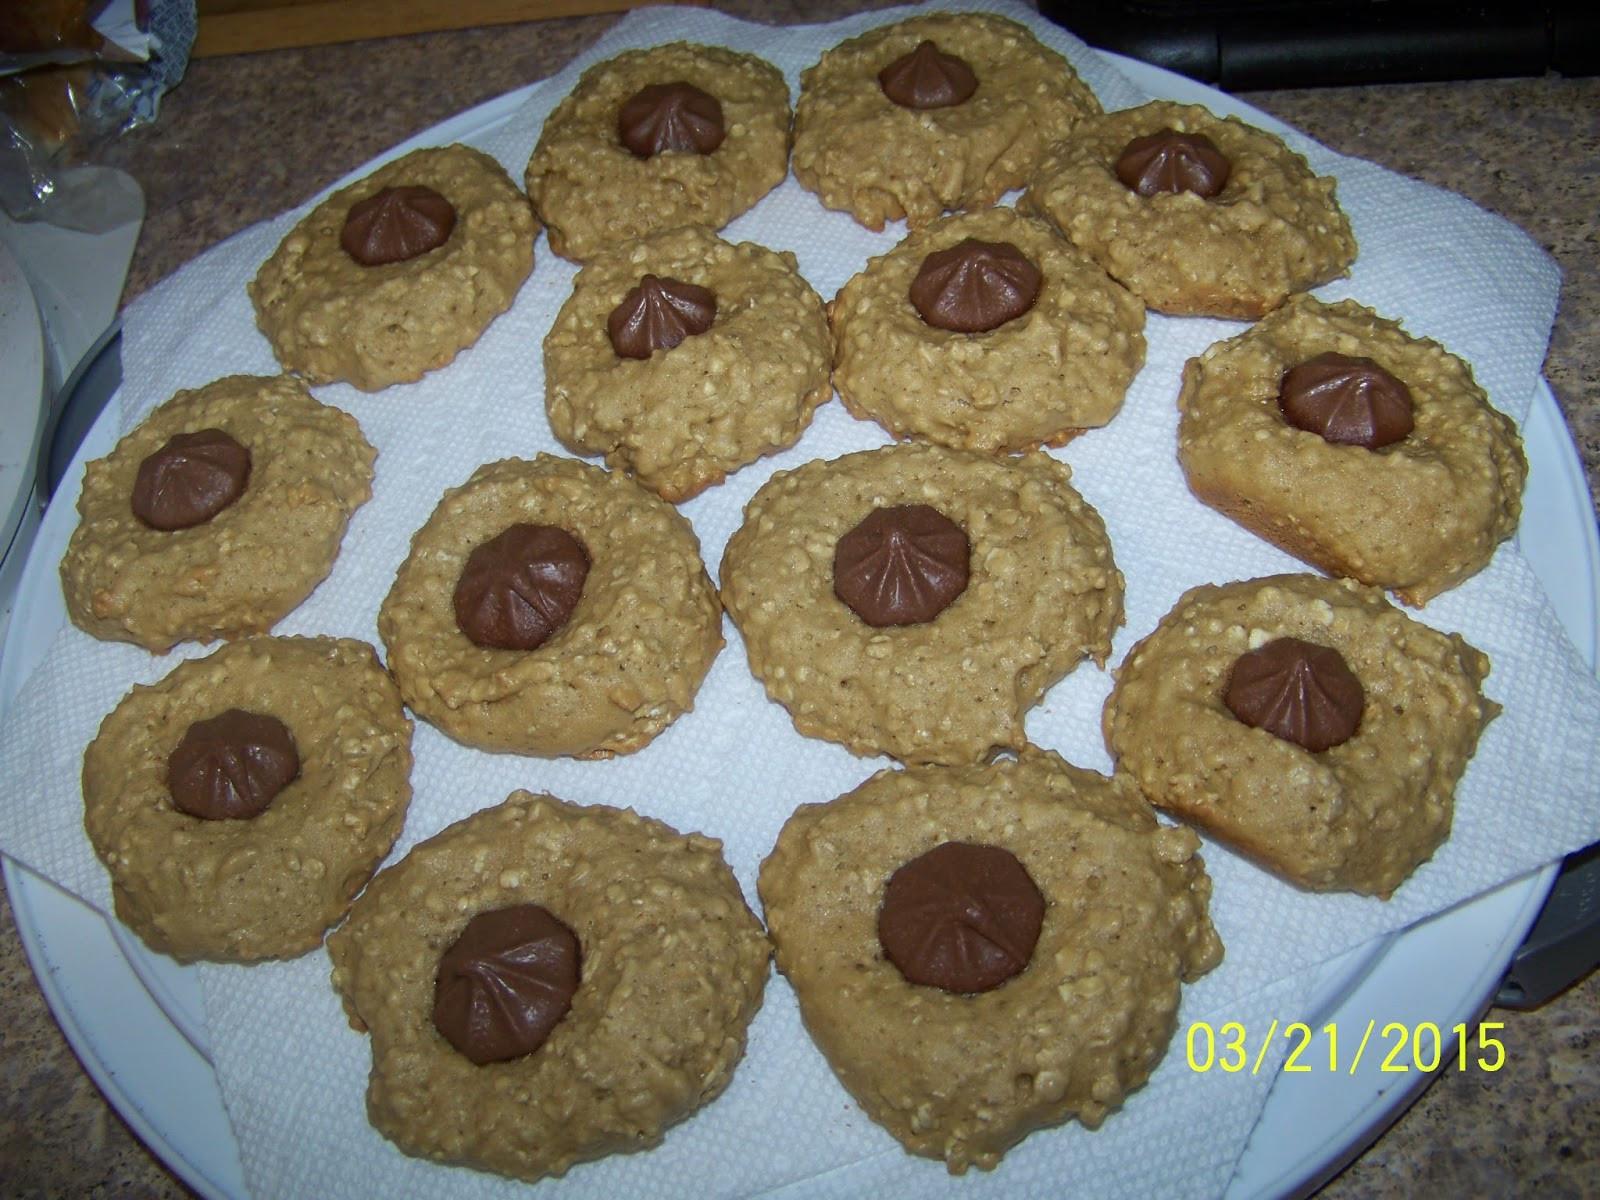 Diabetic Friendly Oatmeal Cookies  FoodOhLicious Chocolate STAR Oatmeal Cookies Diabetic